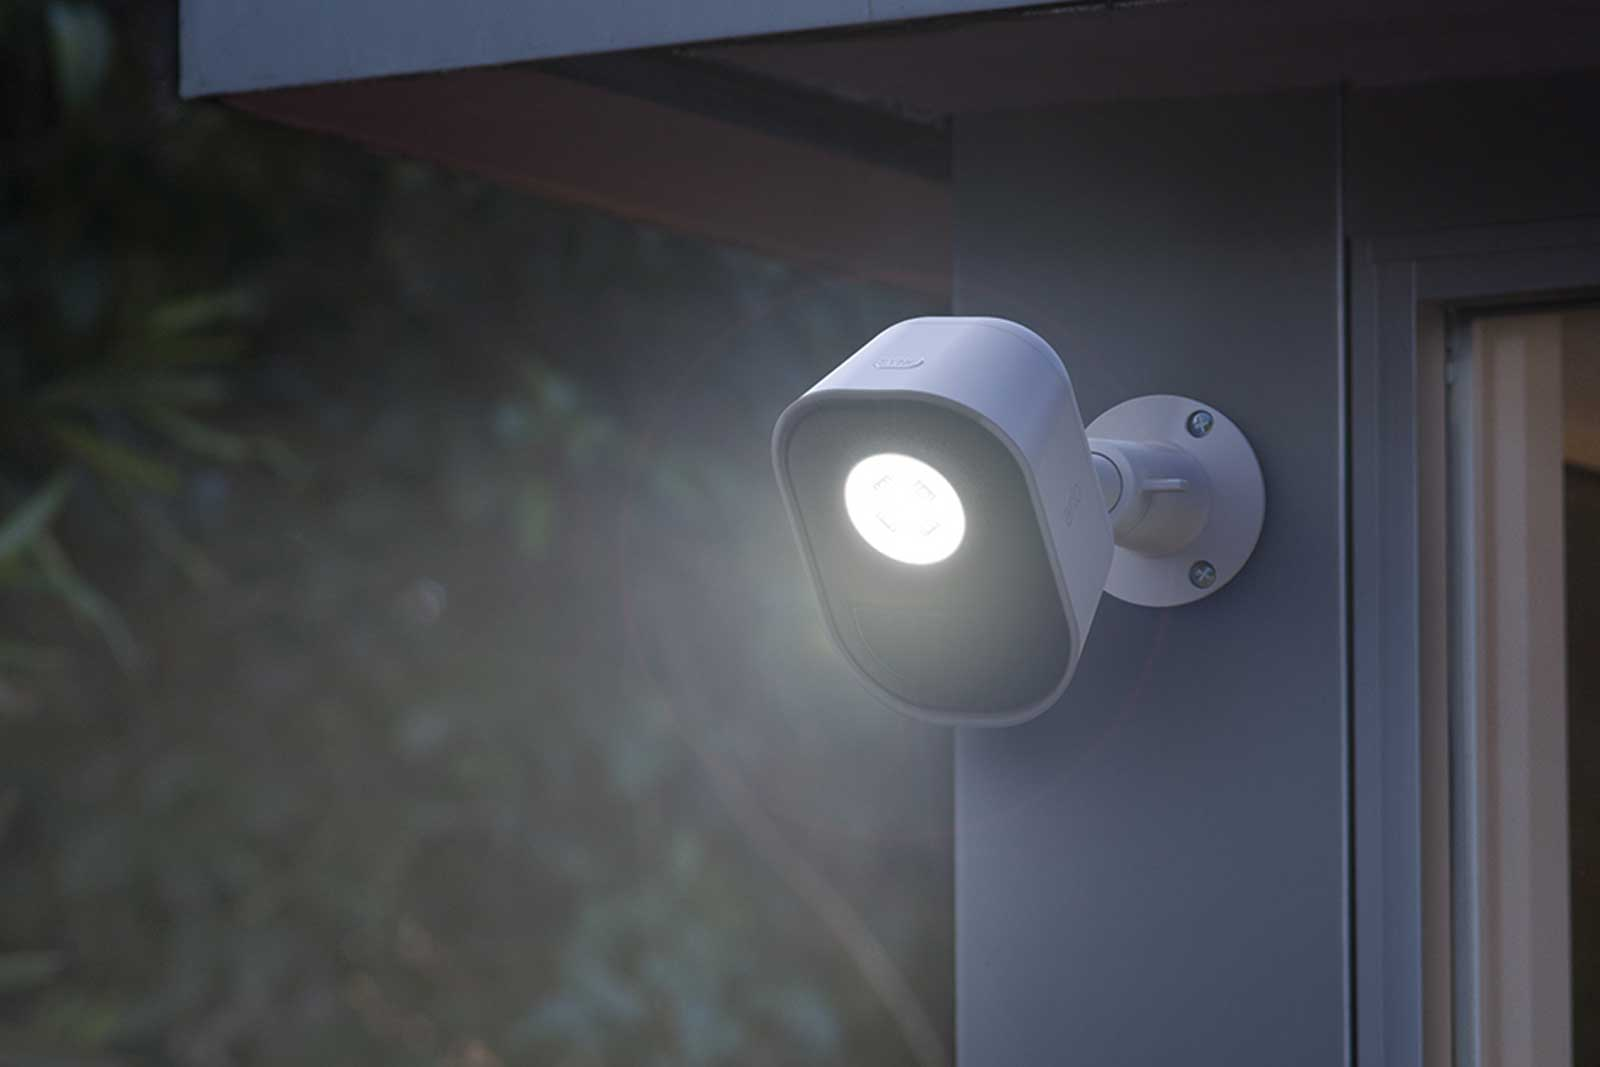 Arlo S Smart Security Light Helps Ward Off Nighttime Intruders